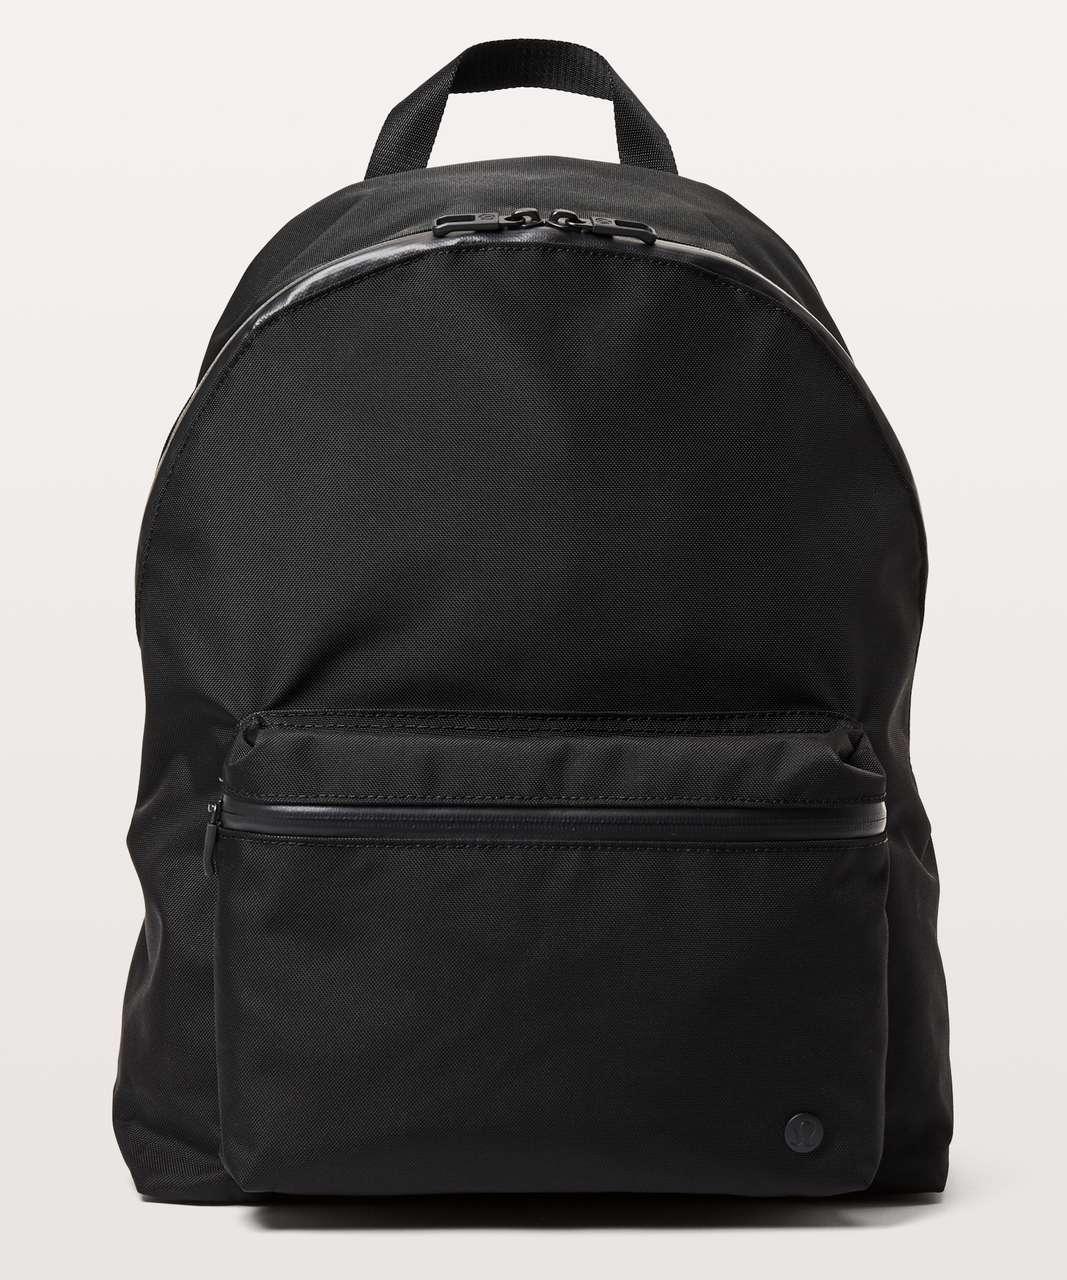 0c7bbe8383 Lululemon Mainstay Backpack *22L - Black - lulu fanatics